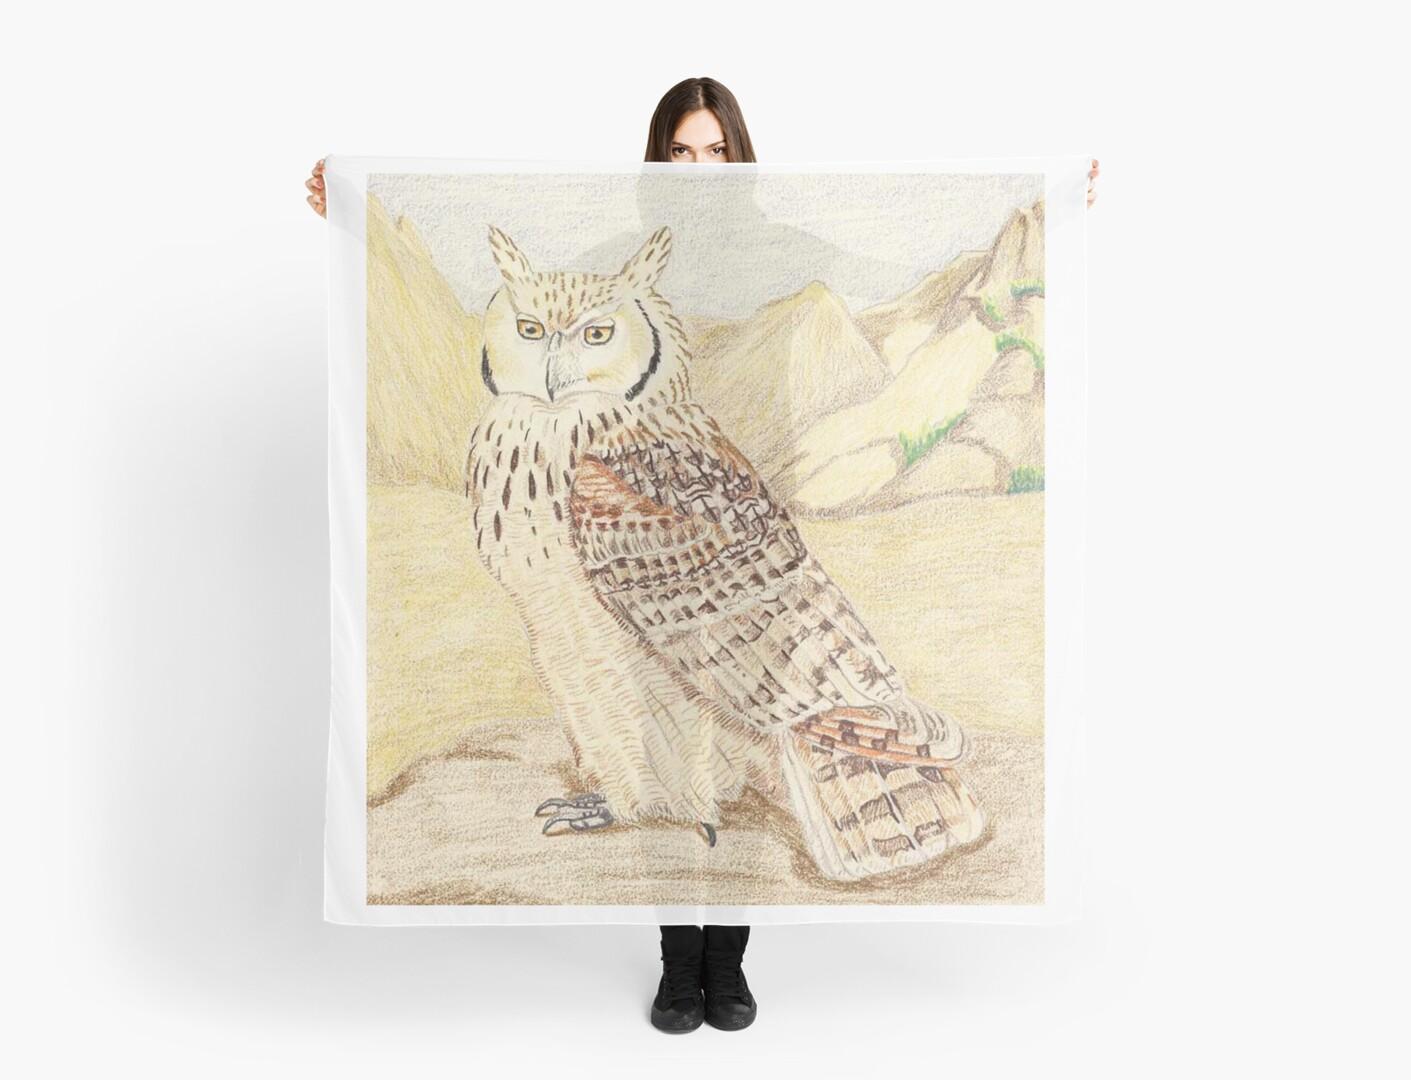 Pharaoh Eagle Owl Subspecies Scarves By Pinkyjainpan